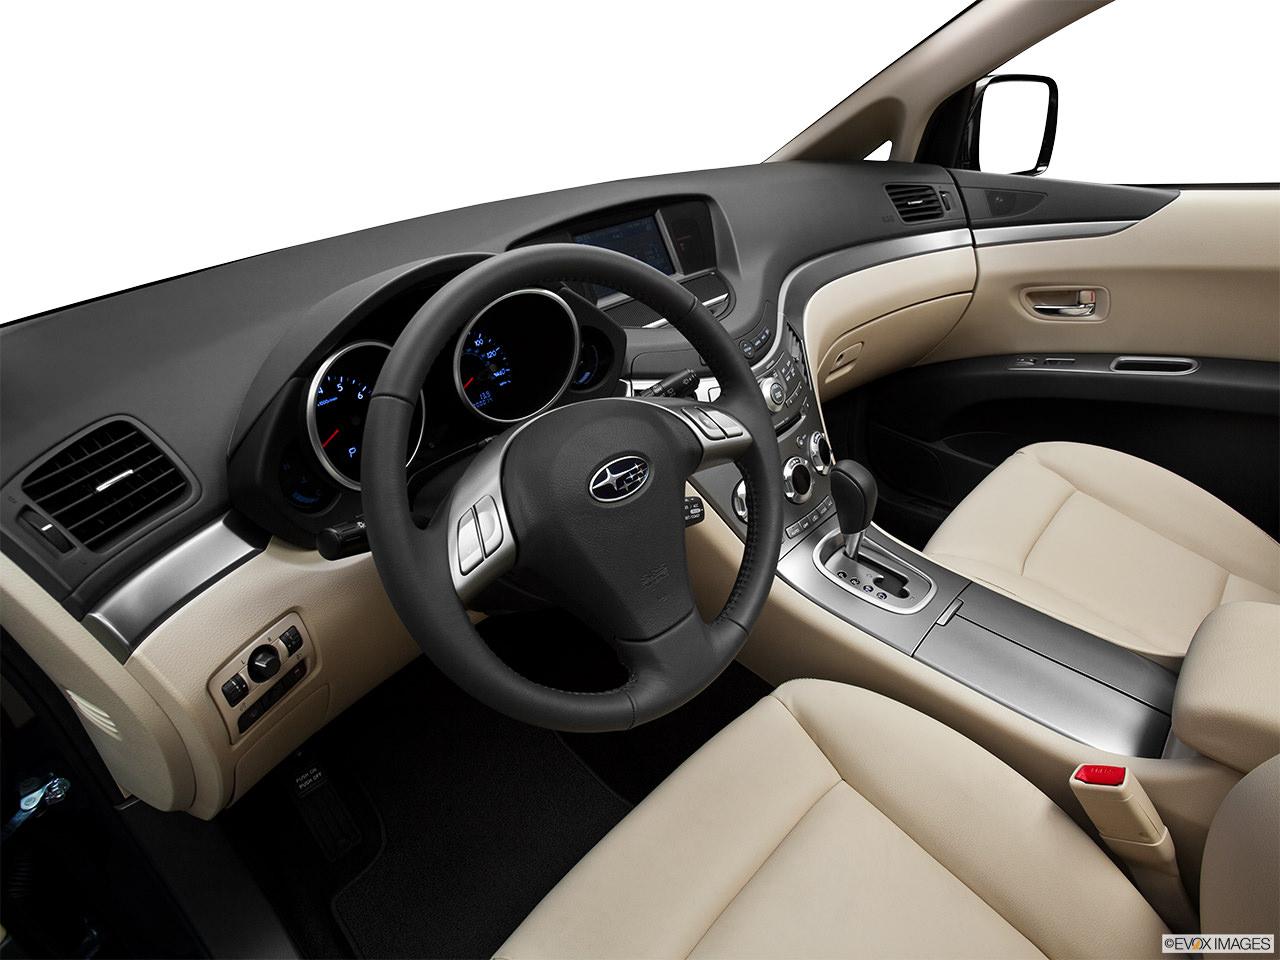 Subaru Tribeca 2012 Interior